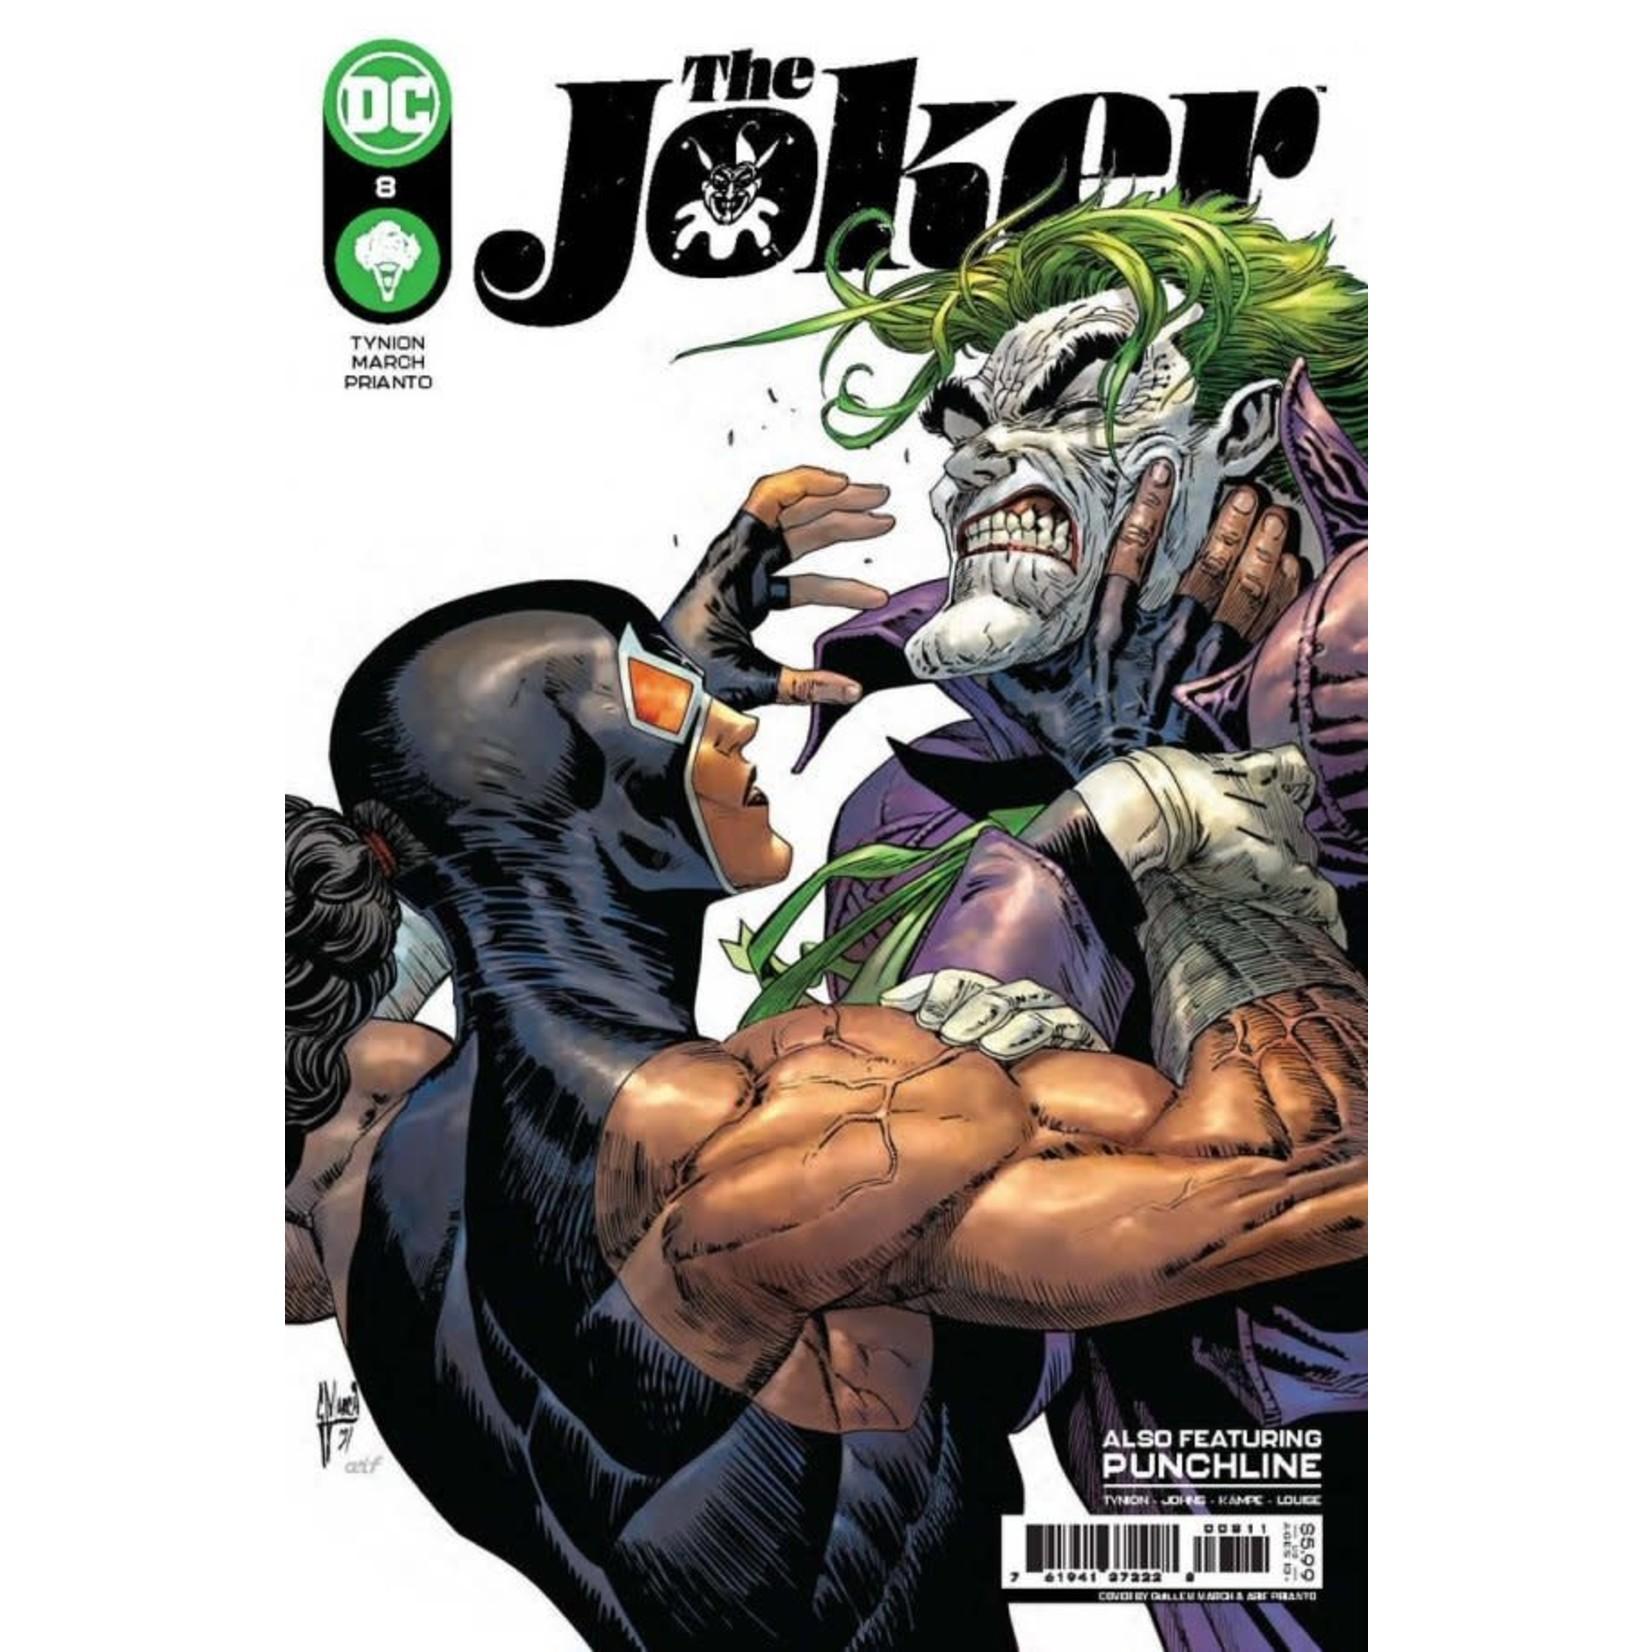 DC Comics The Joker #8